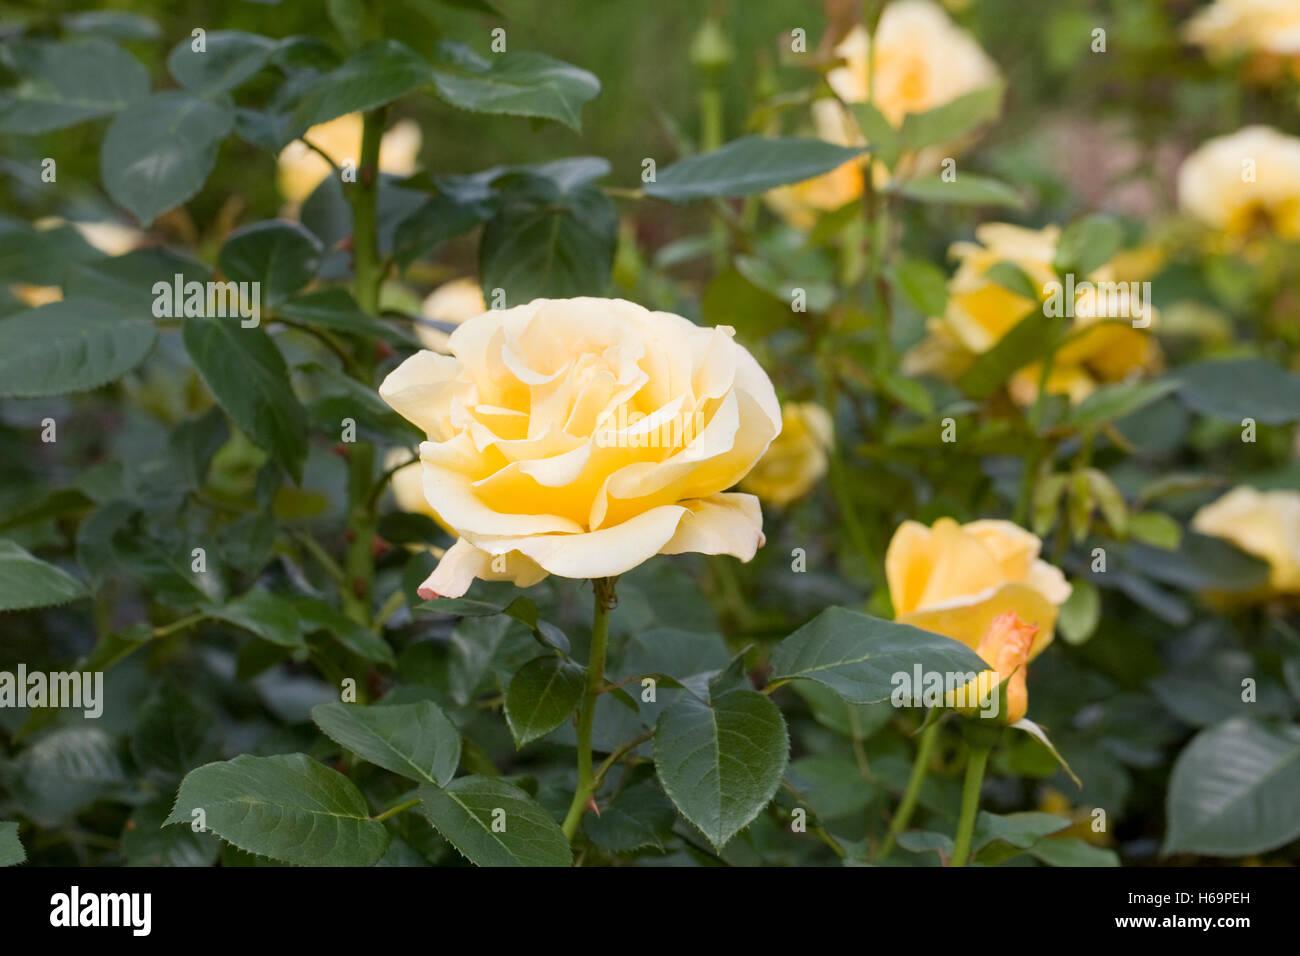 Rosa Glorious Interictira. Yellow shrub rose in an English garden. - Stock Image